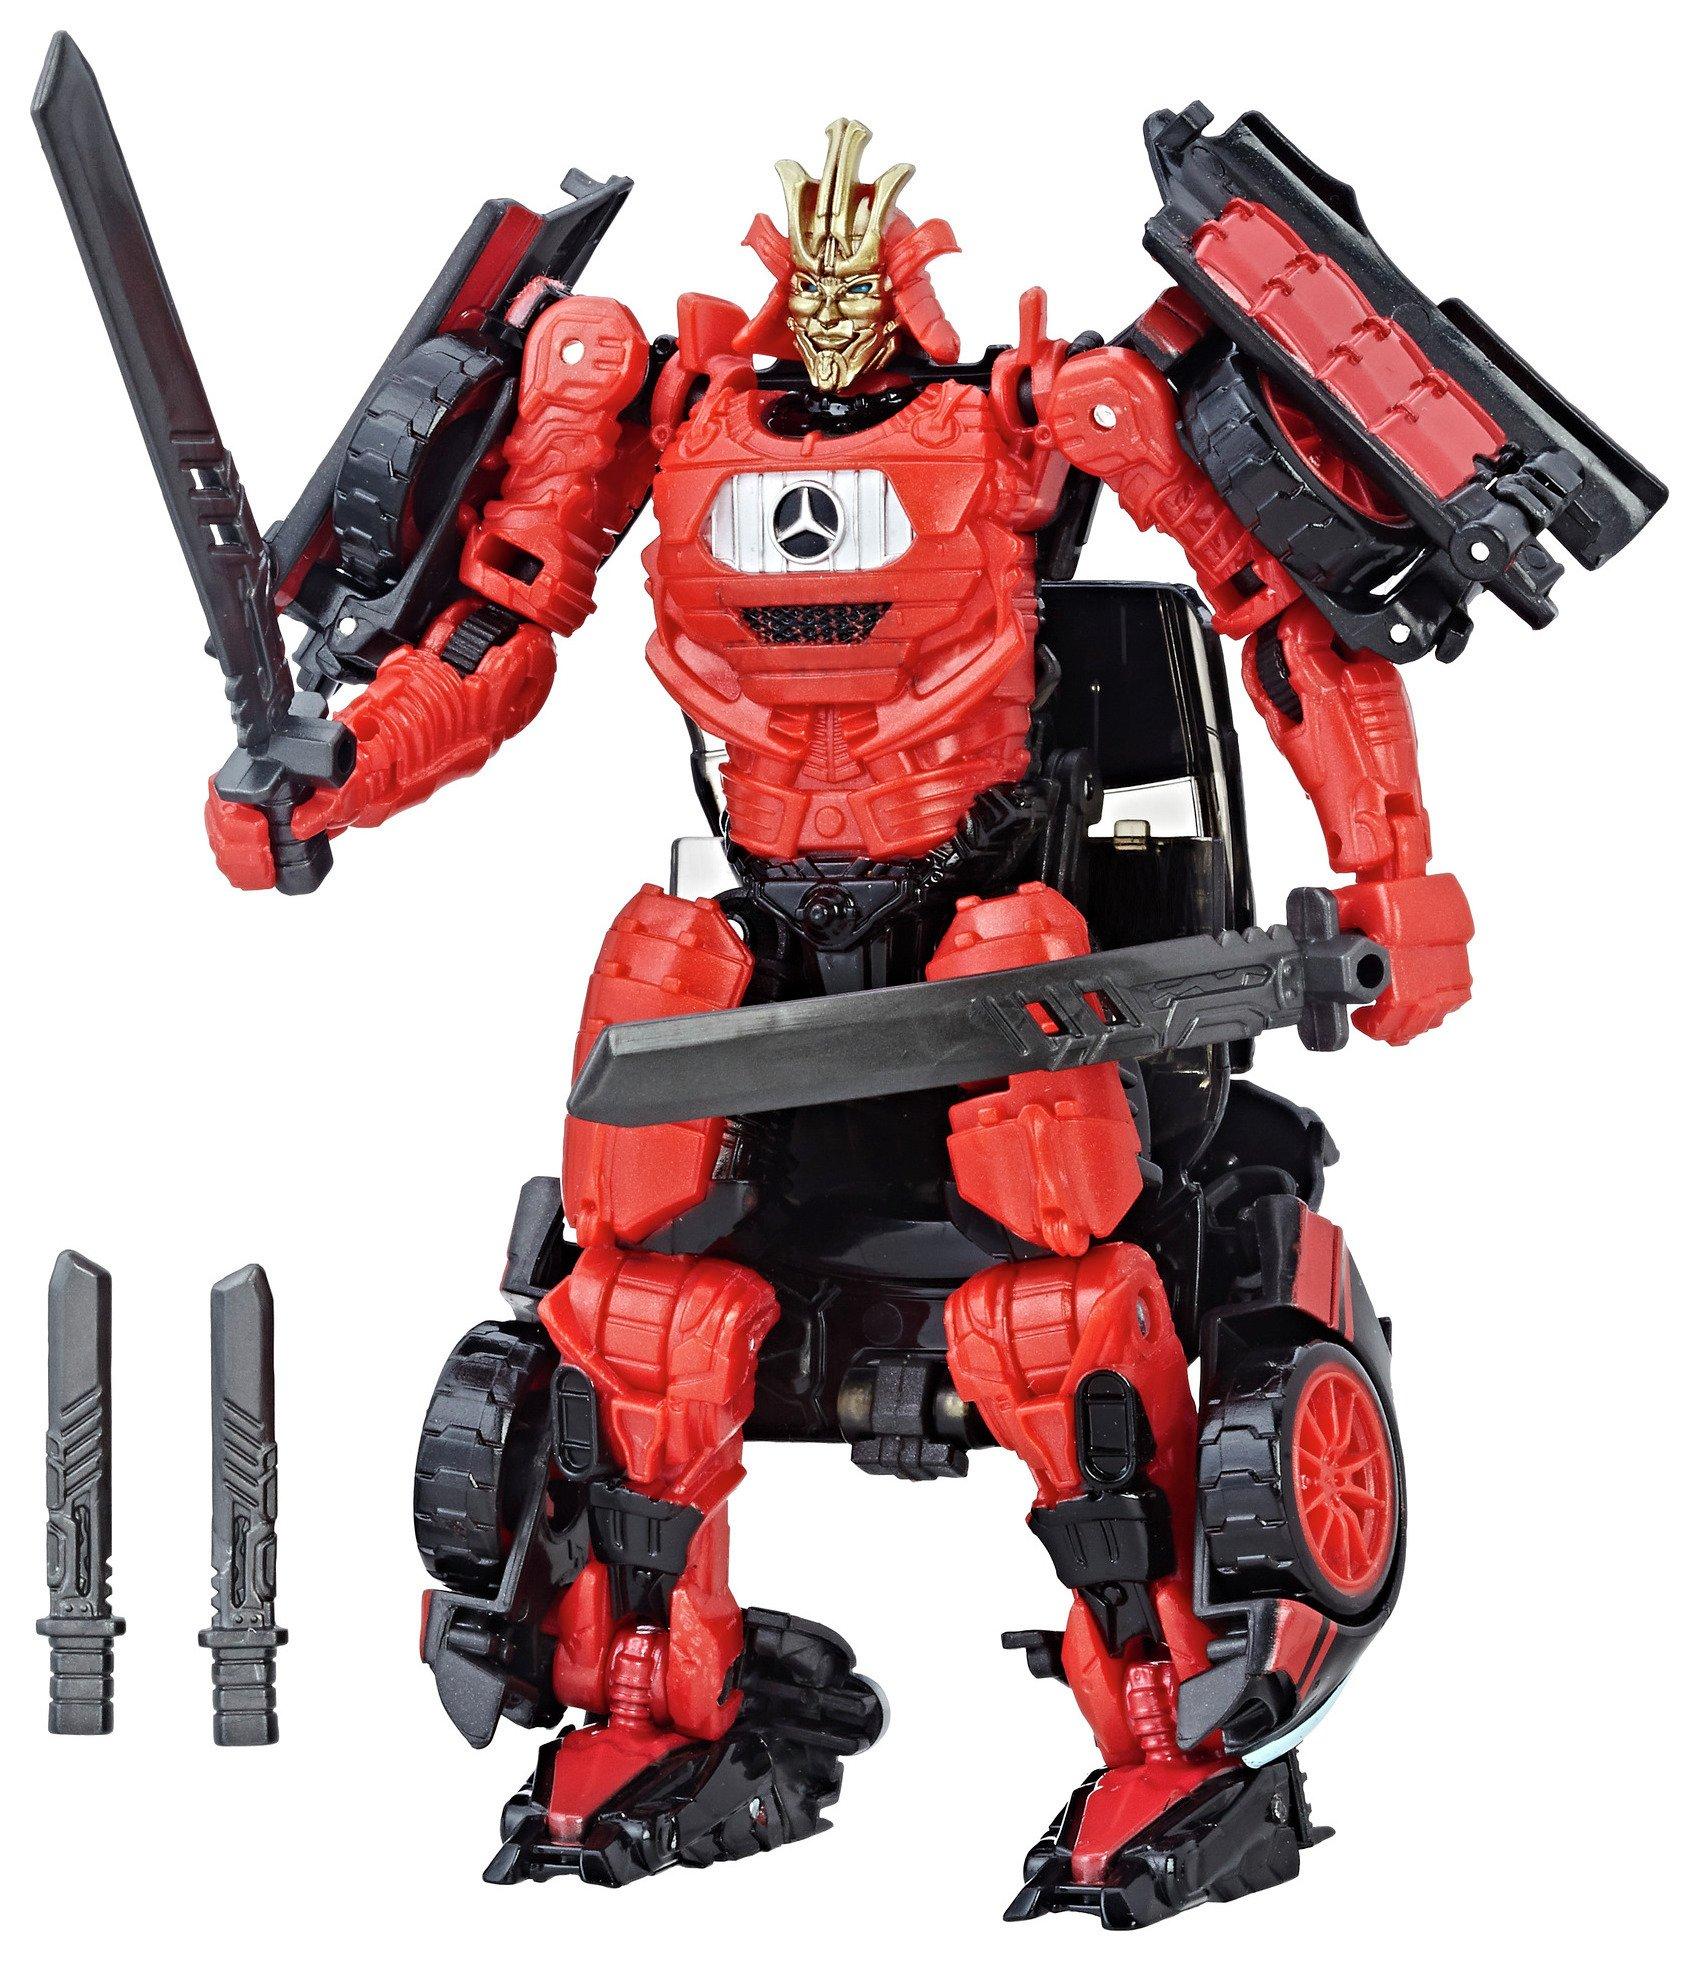 Transformers Premier Edition Deluxe Autobot Drift